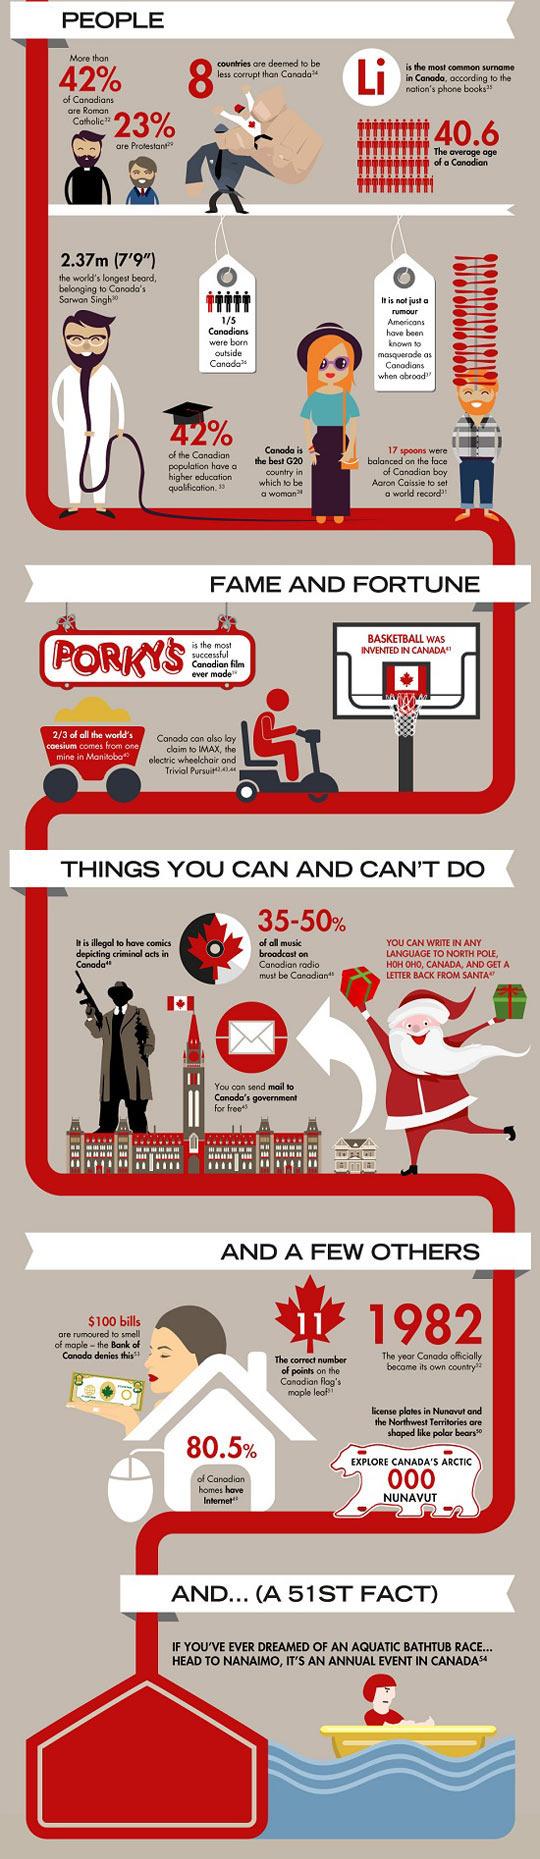 funny-Canada-insane-facts-life